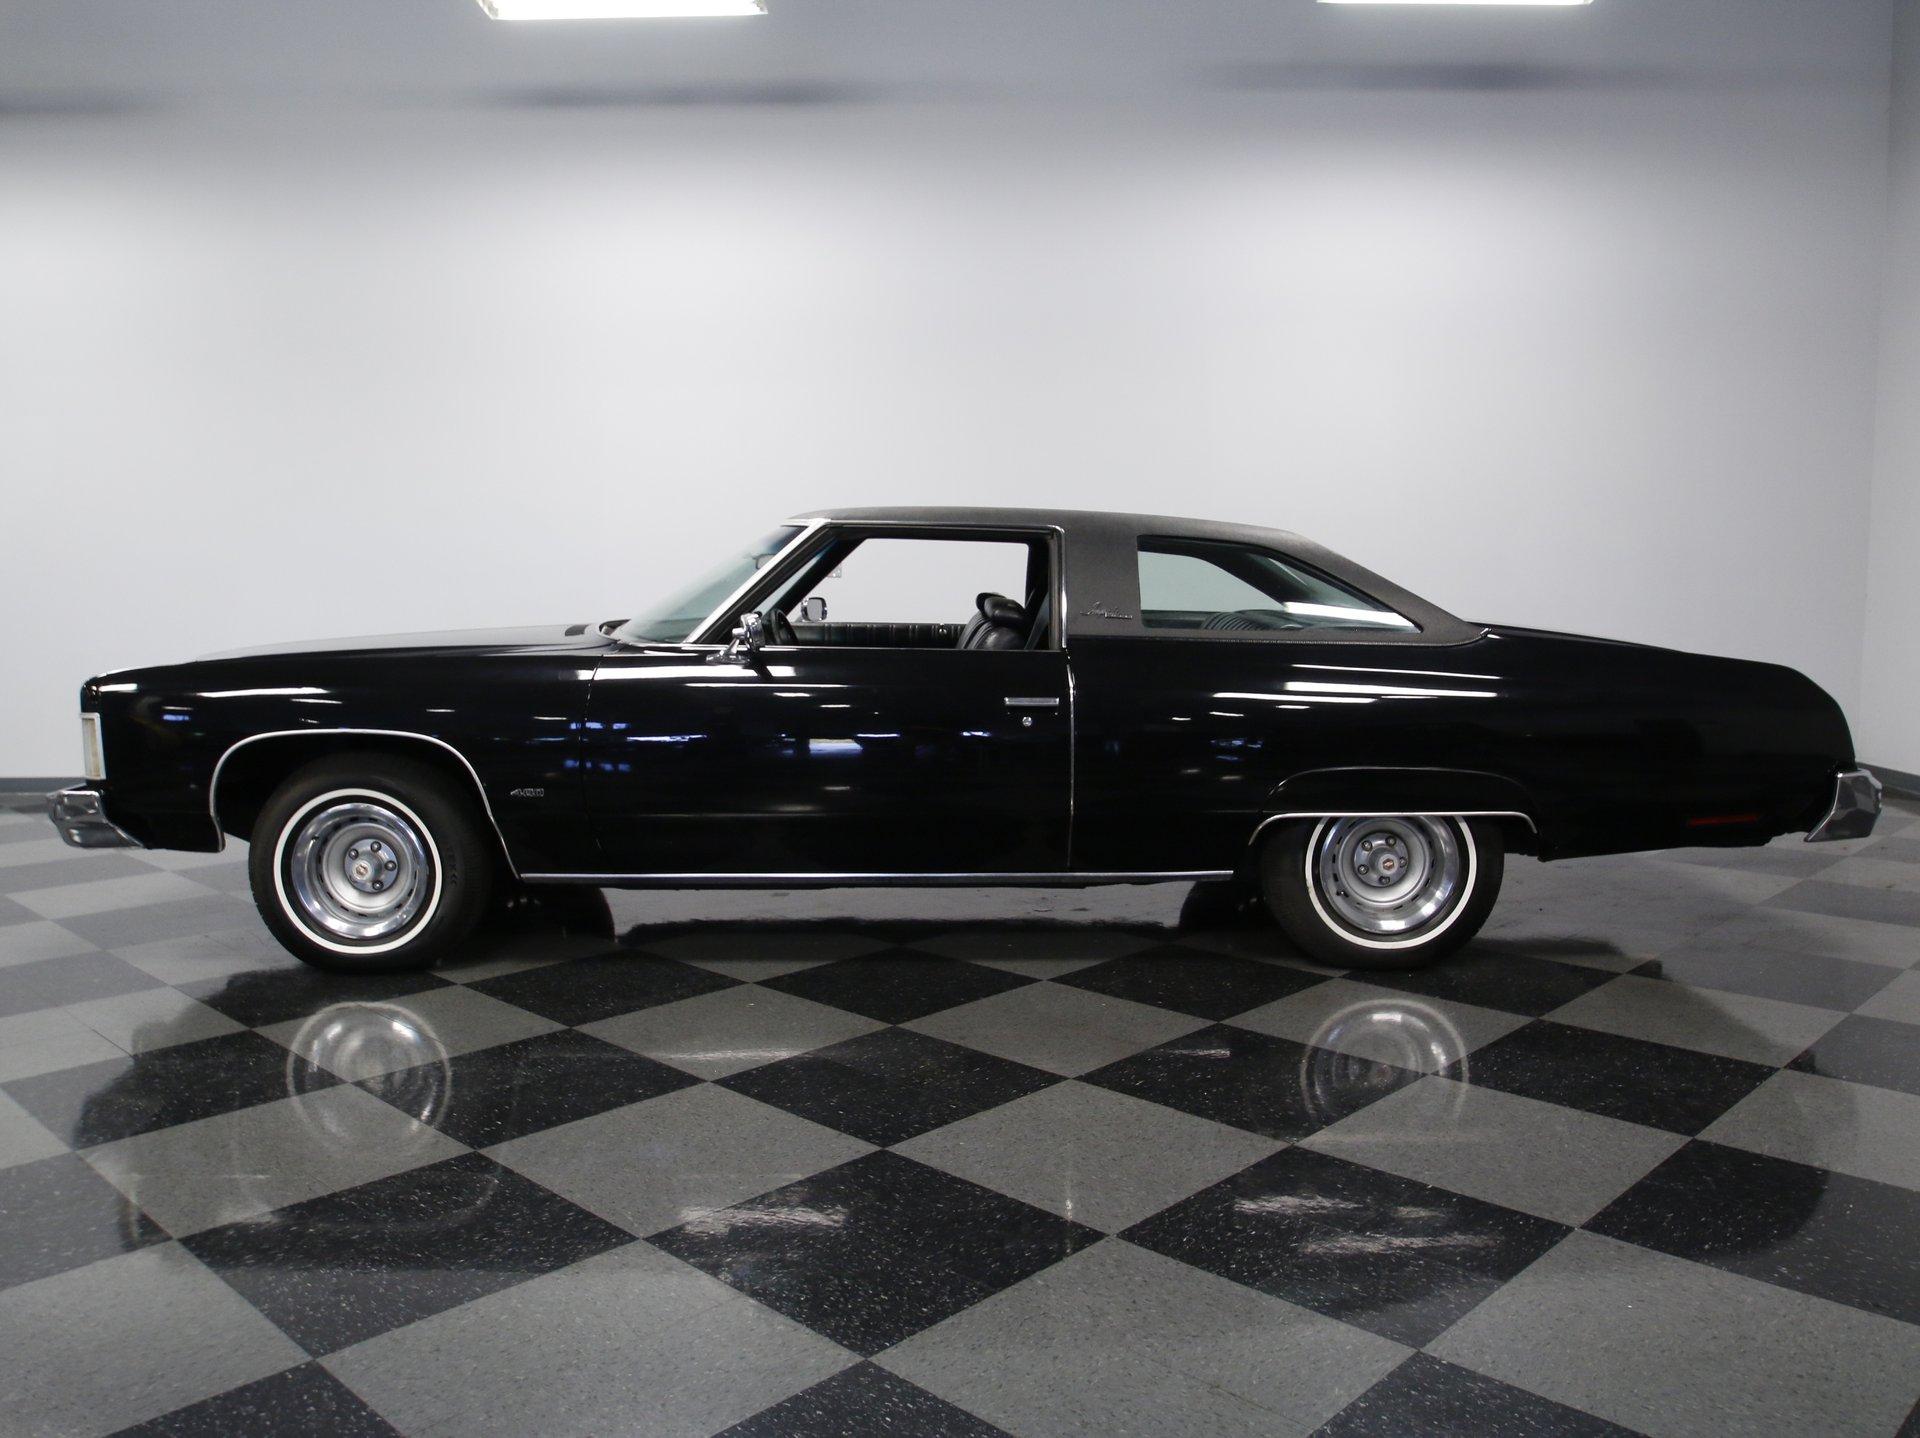 1974 chevrolet impala custom coupe